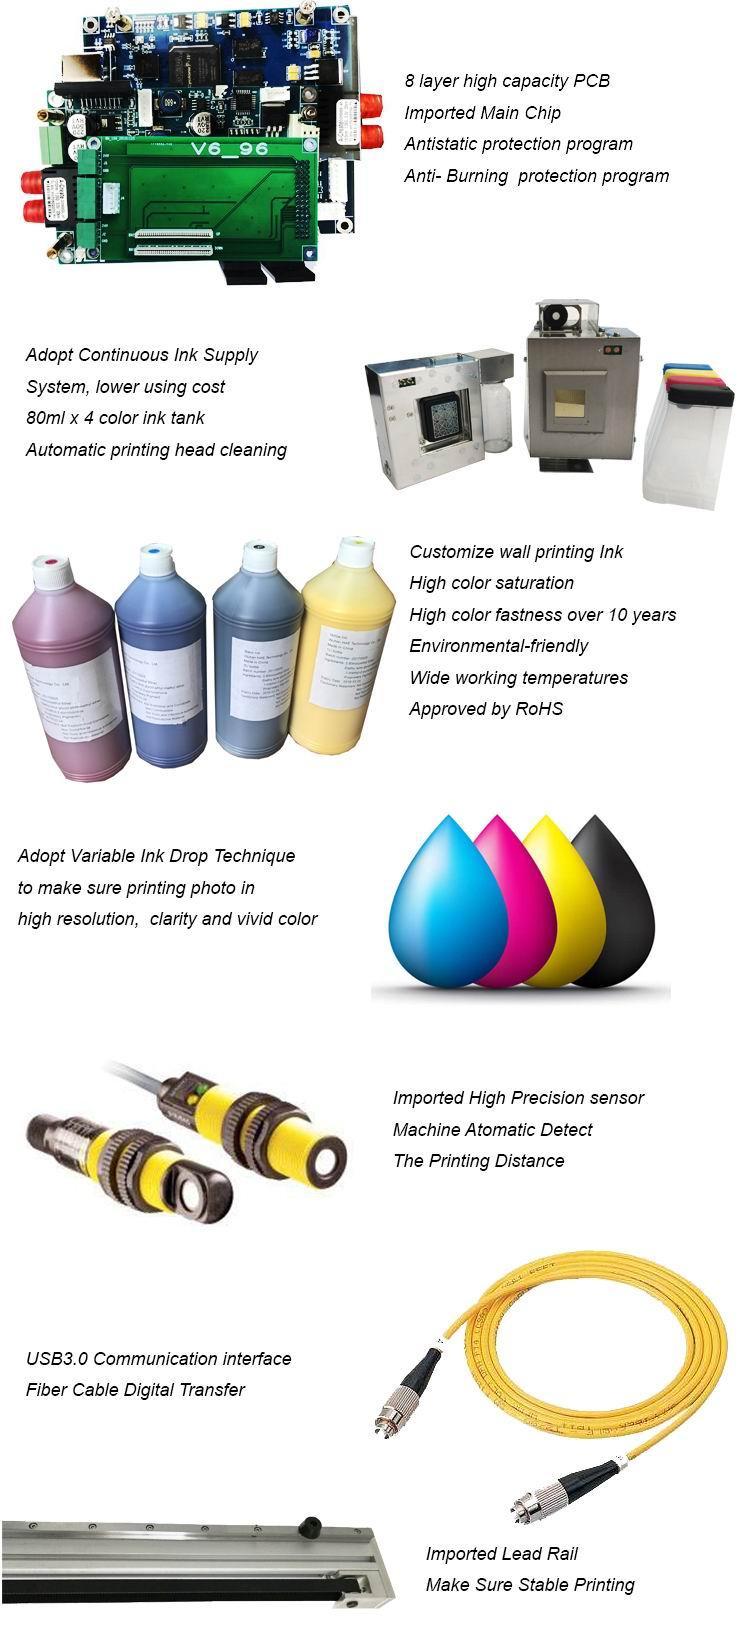 wall printers details